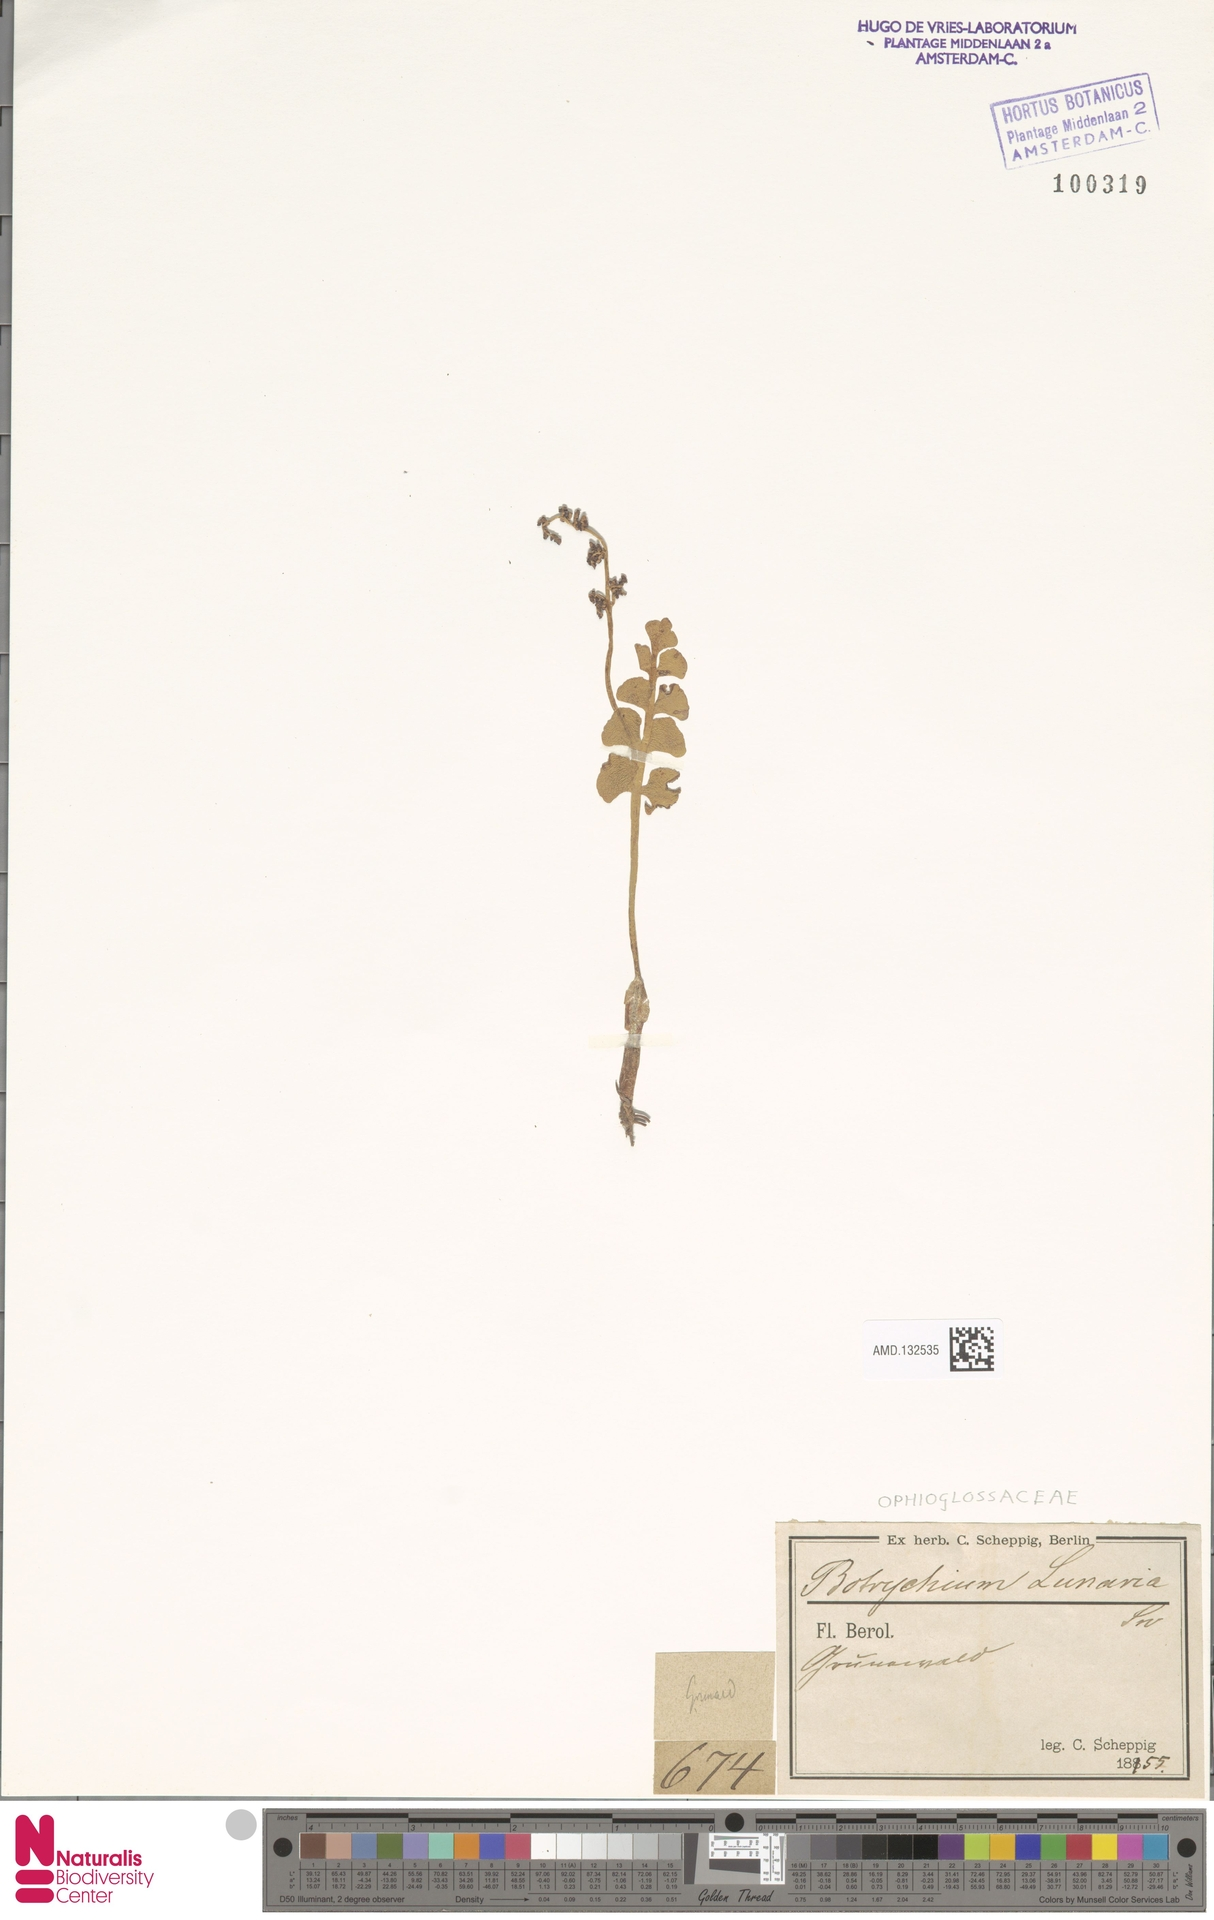 AMD.132535   Botrychium lunaria (L.) Sw.